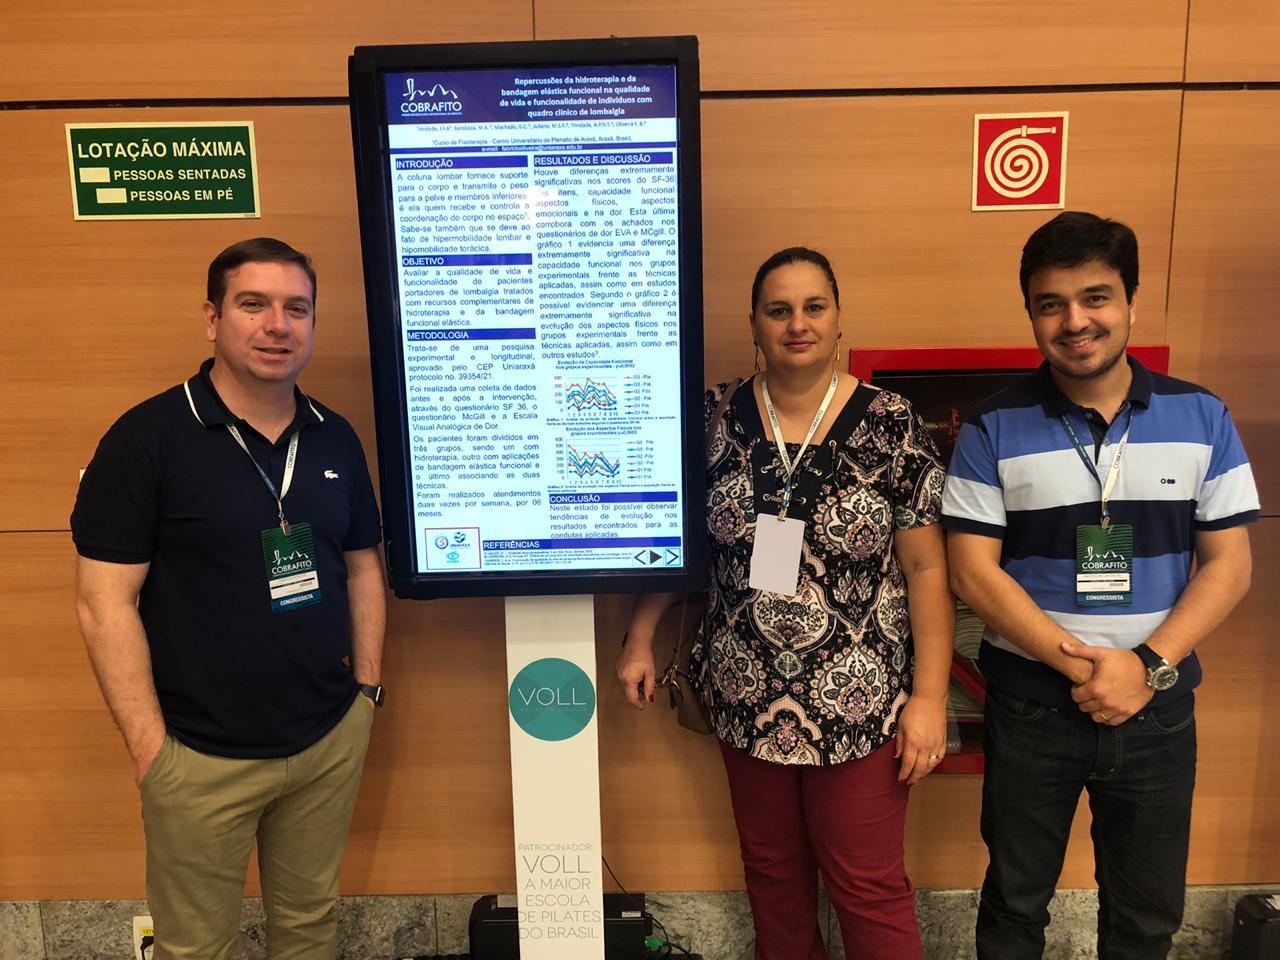 Araxaenses participam de Congresso Brasileiro de Fisioterapia